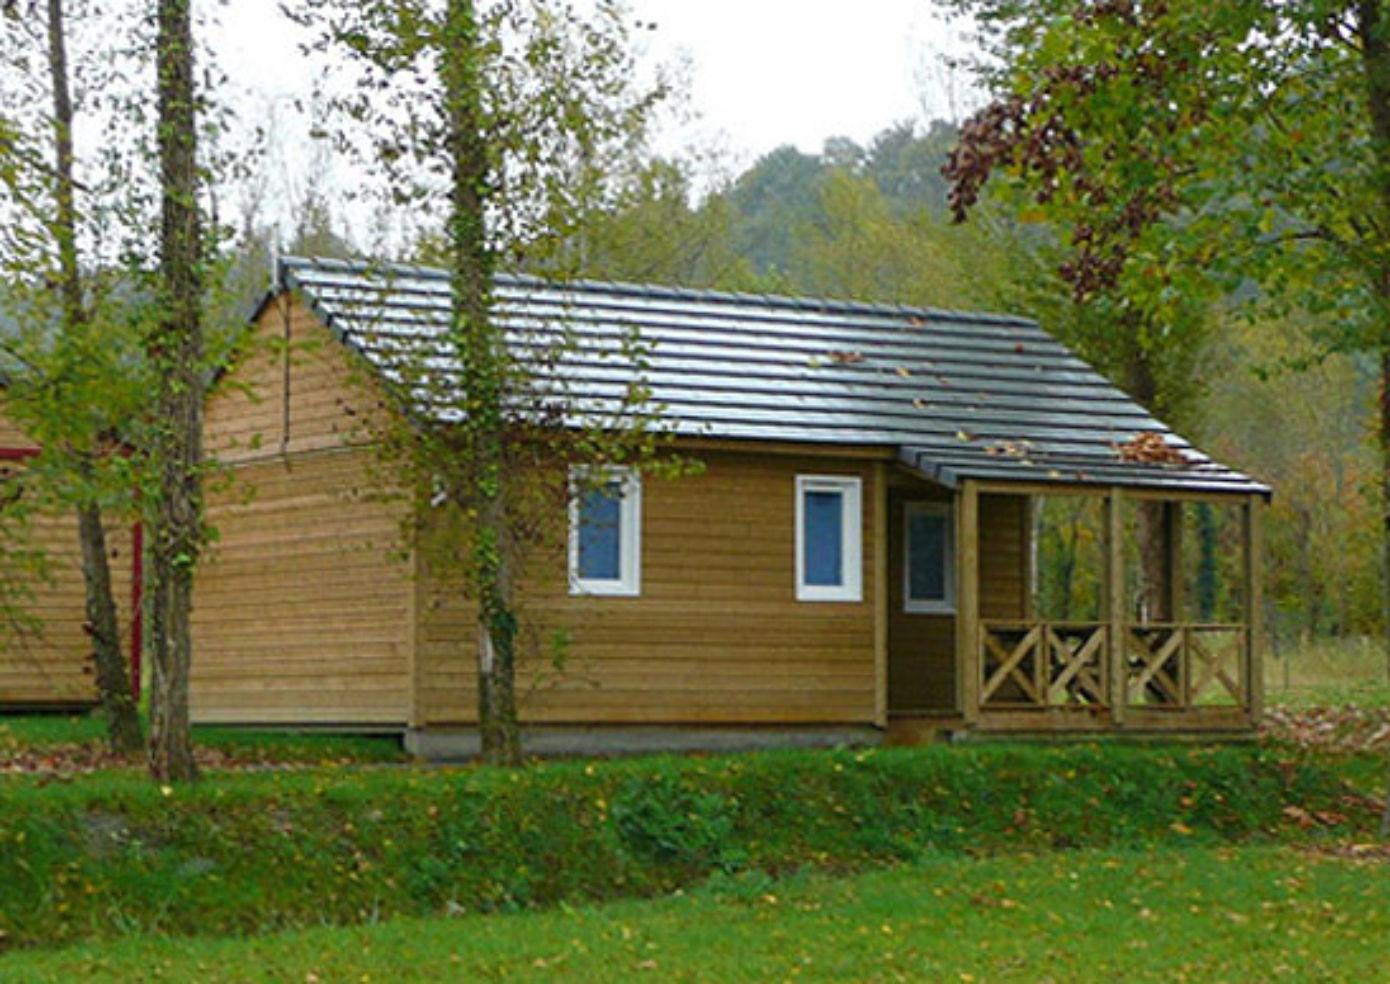 A cottage at Camping de Bordeaux Lac in France